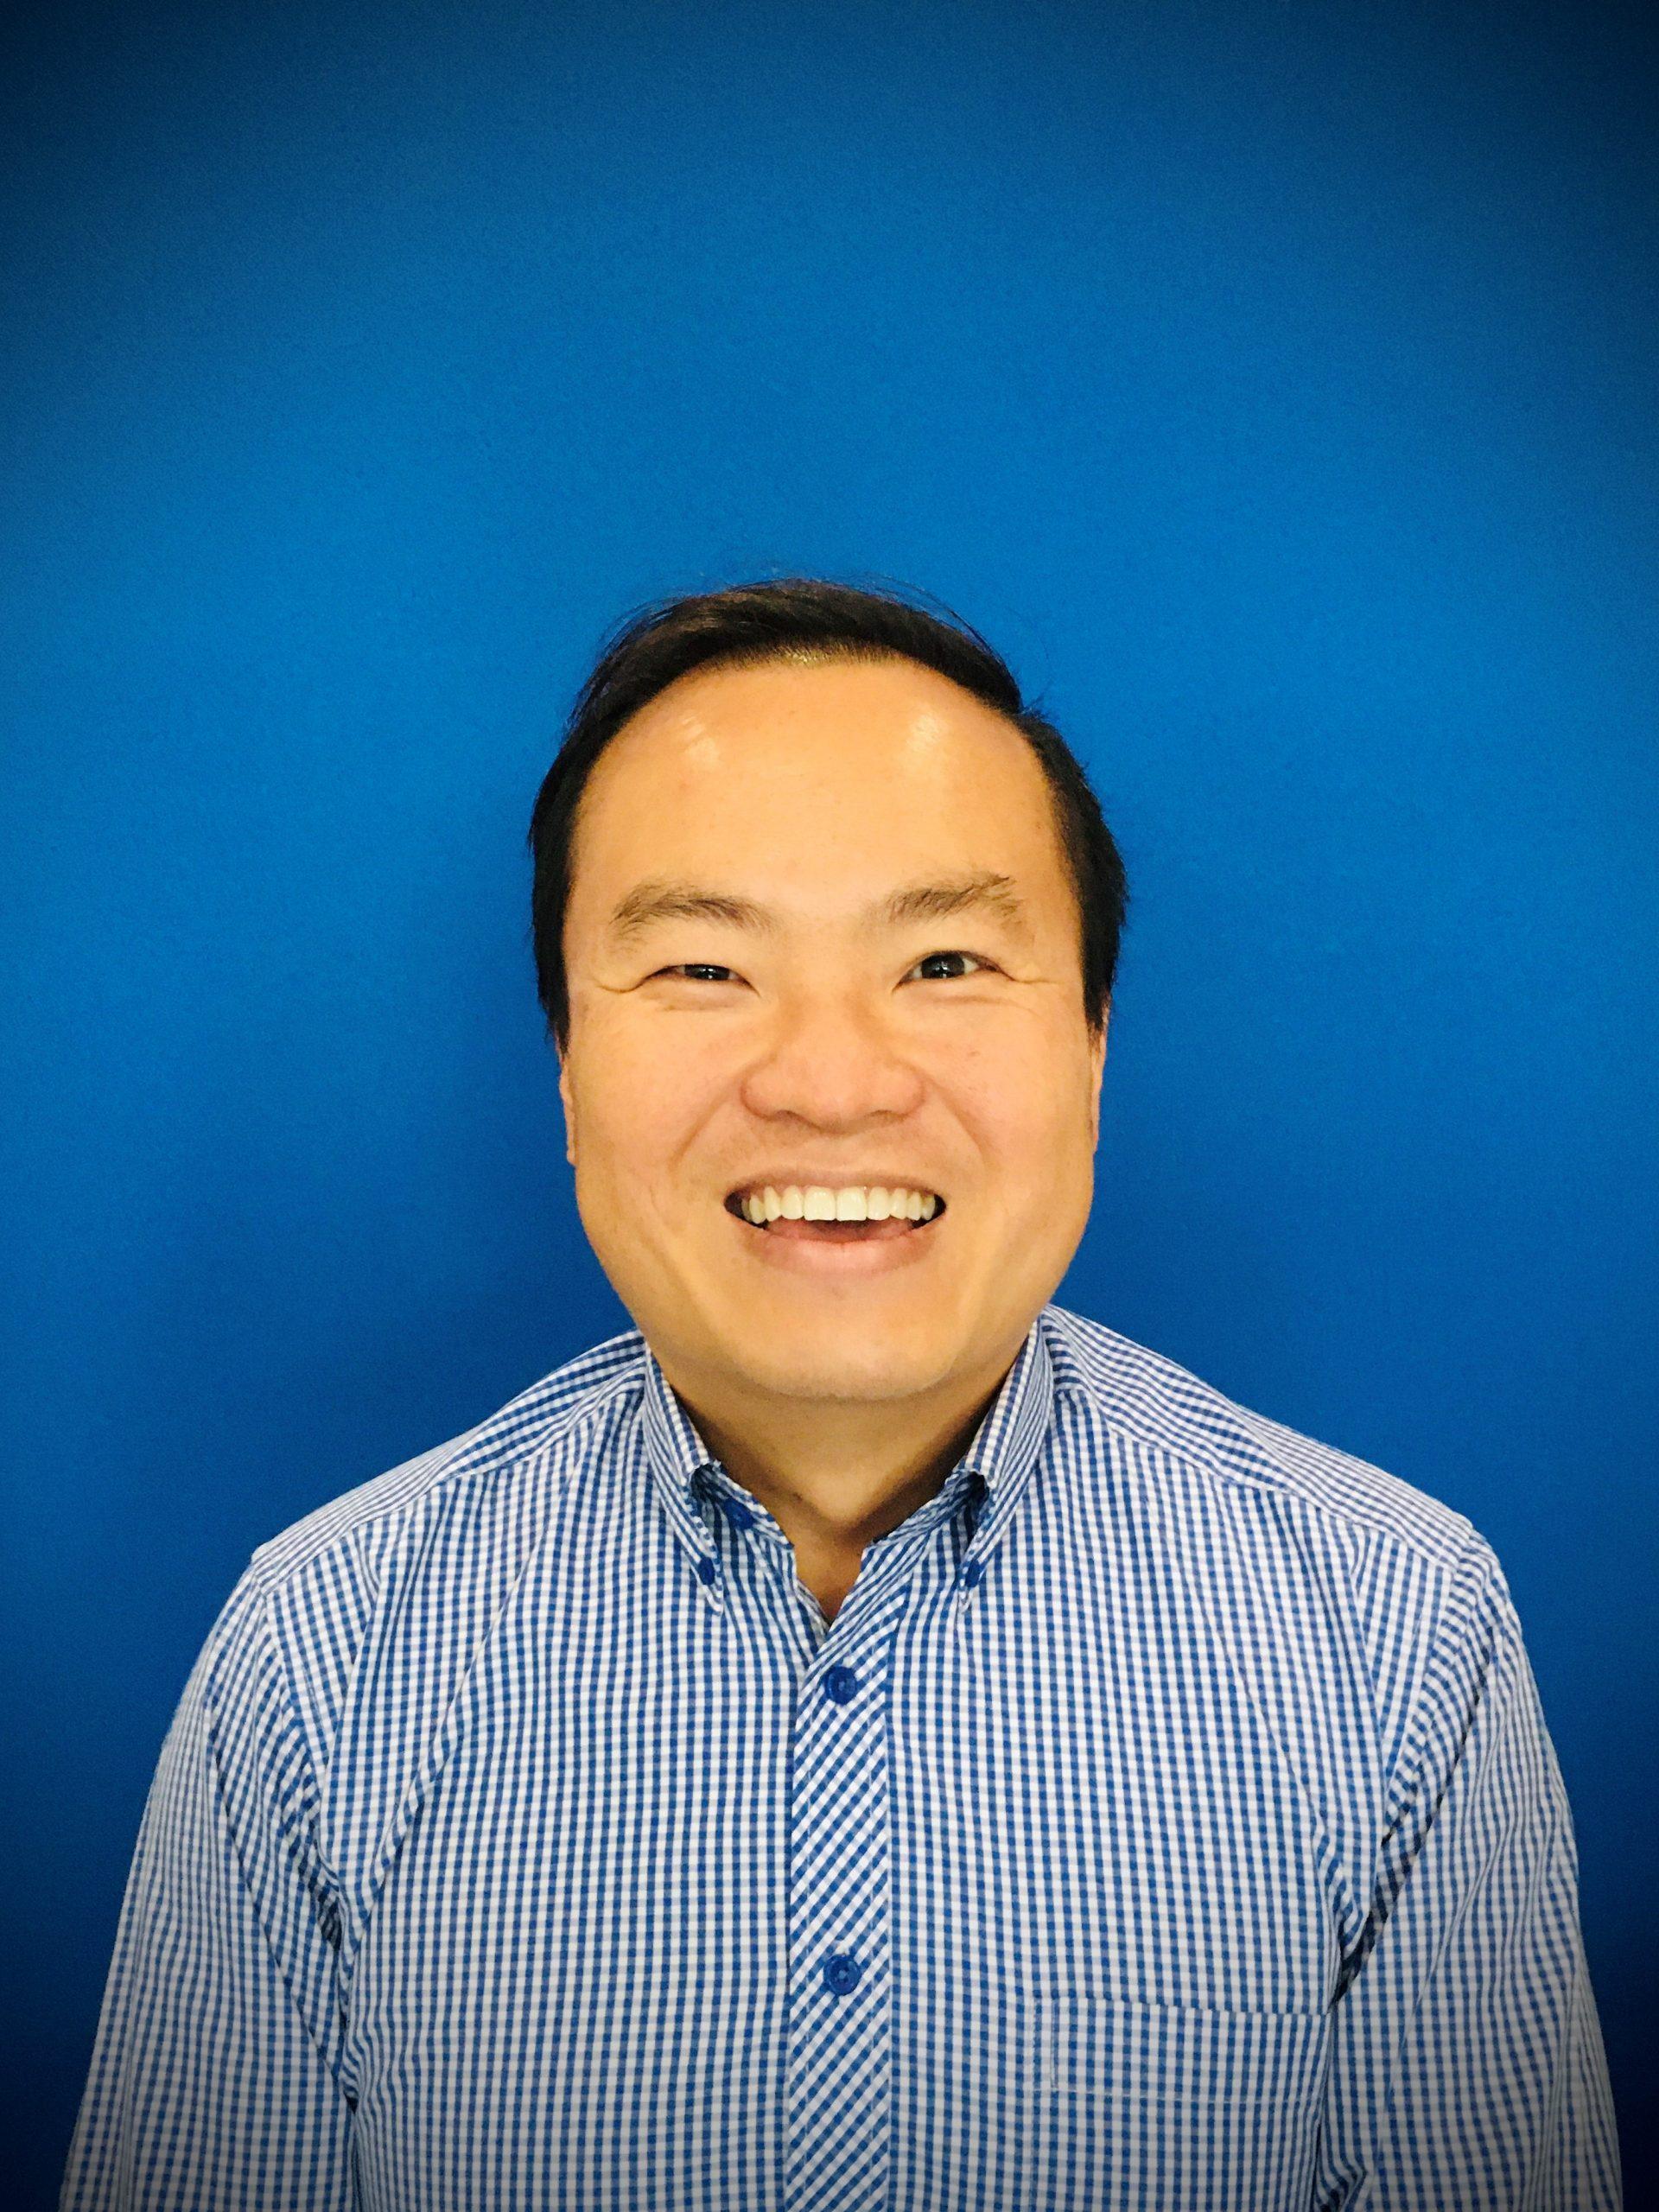 Positivum™ helps Kent build self-confidence and set employment goals